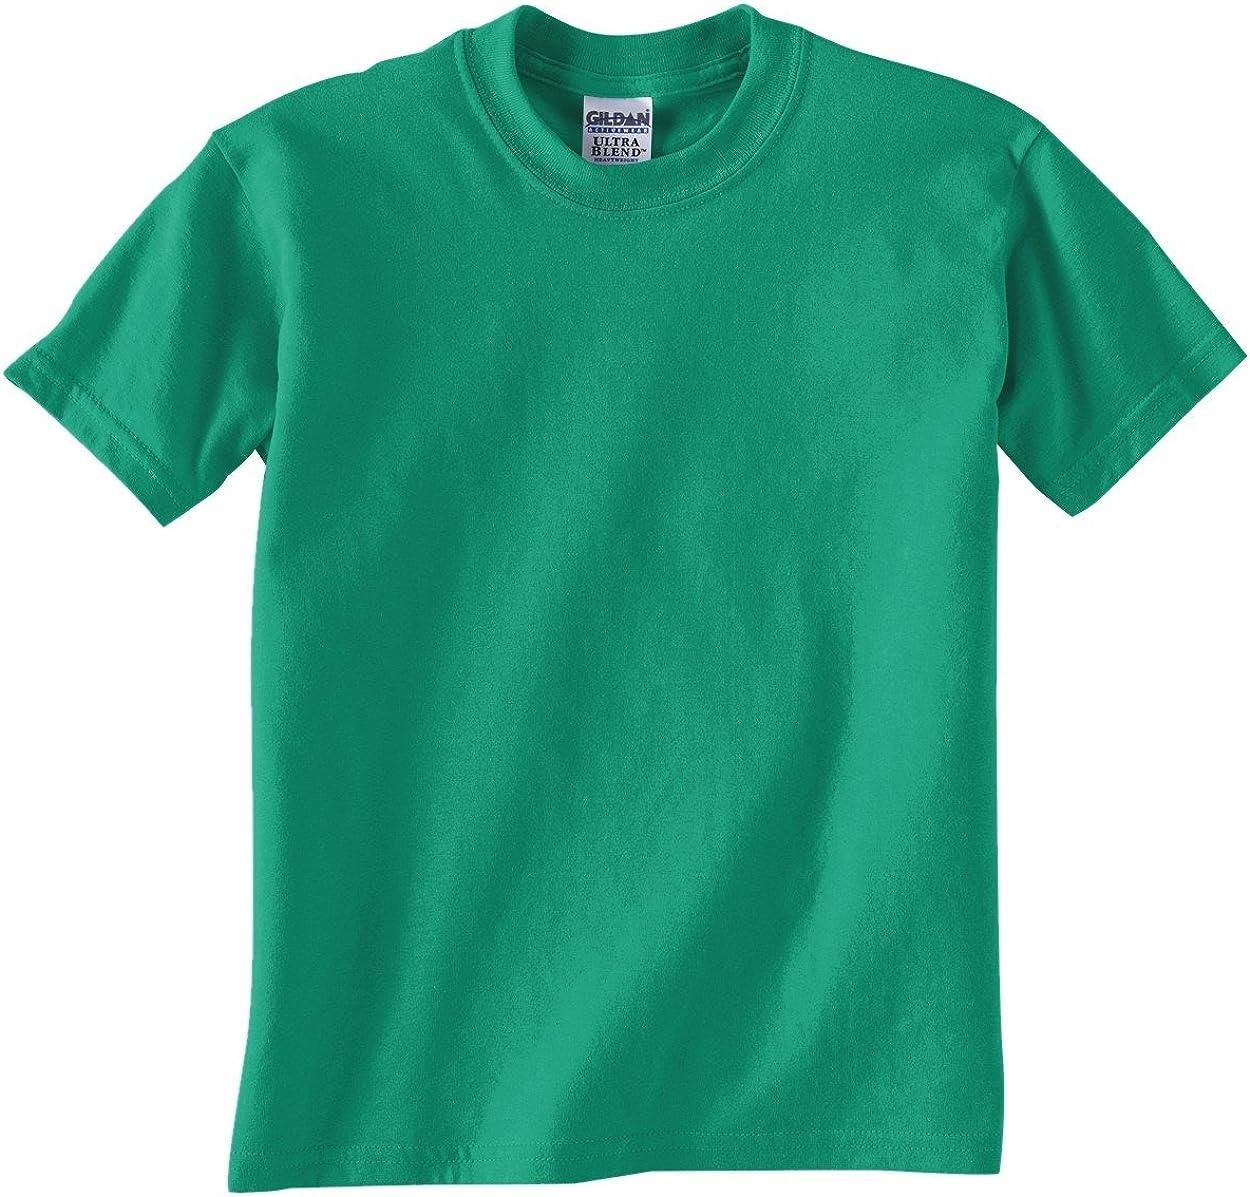 Gildan - Youth DryBlend 50 Cotton/50 DryBlendPoly T-Shirt. 8000B